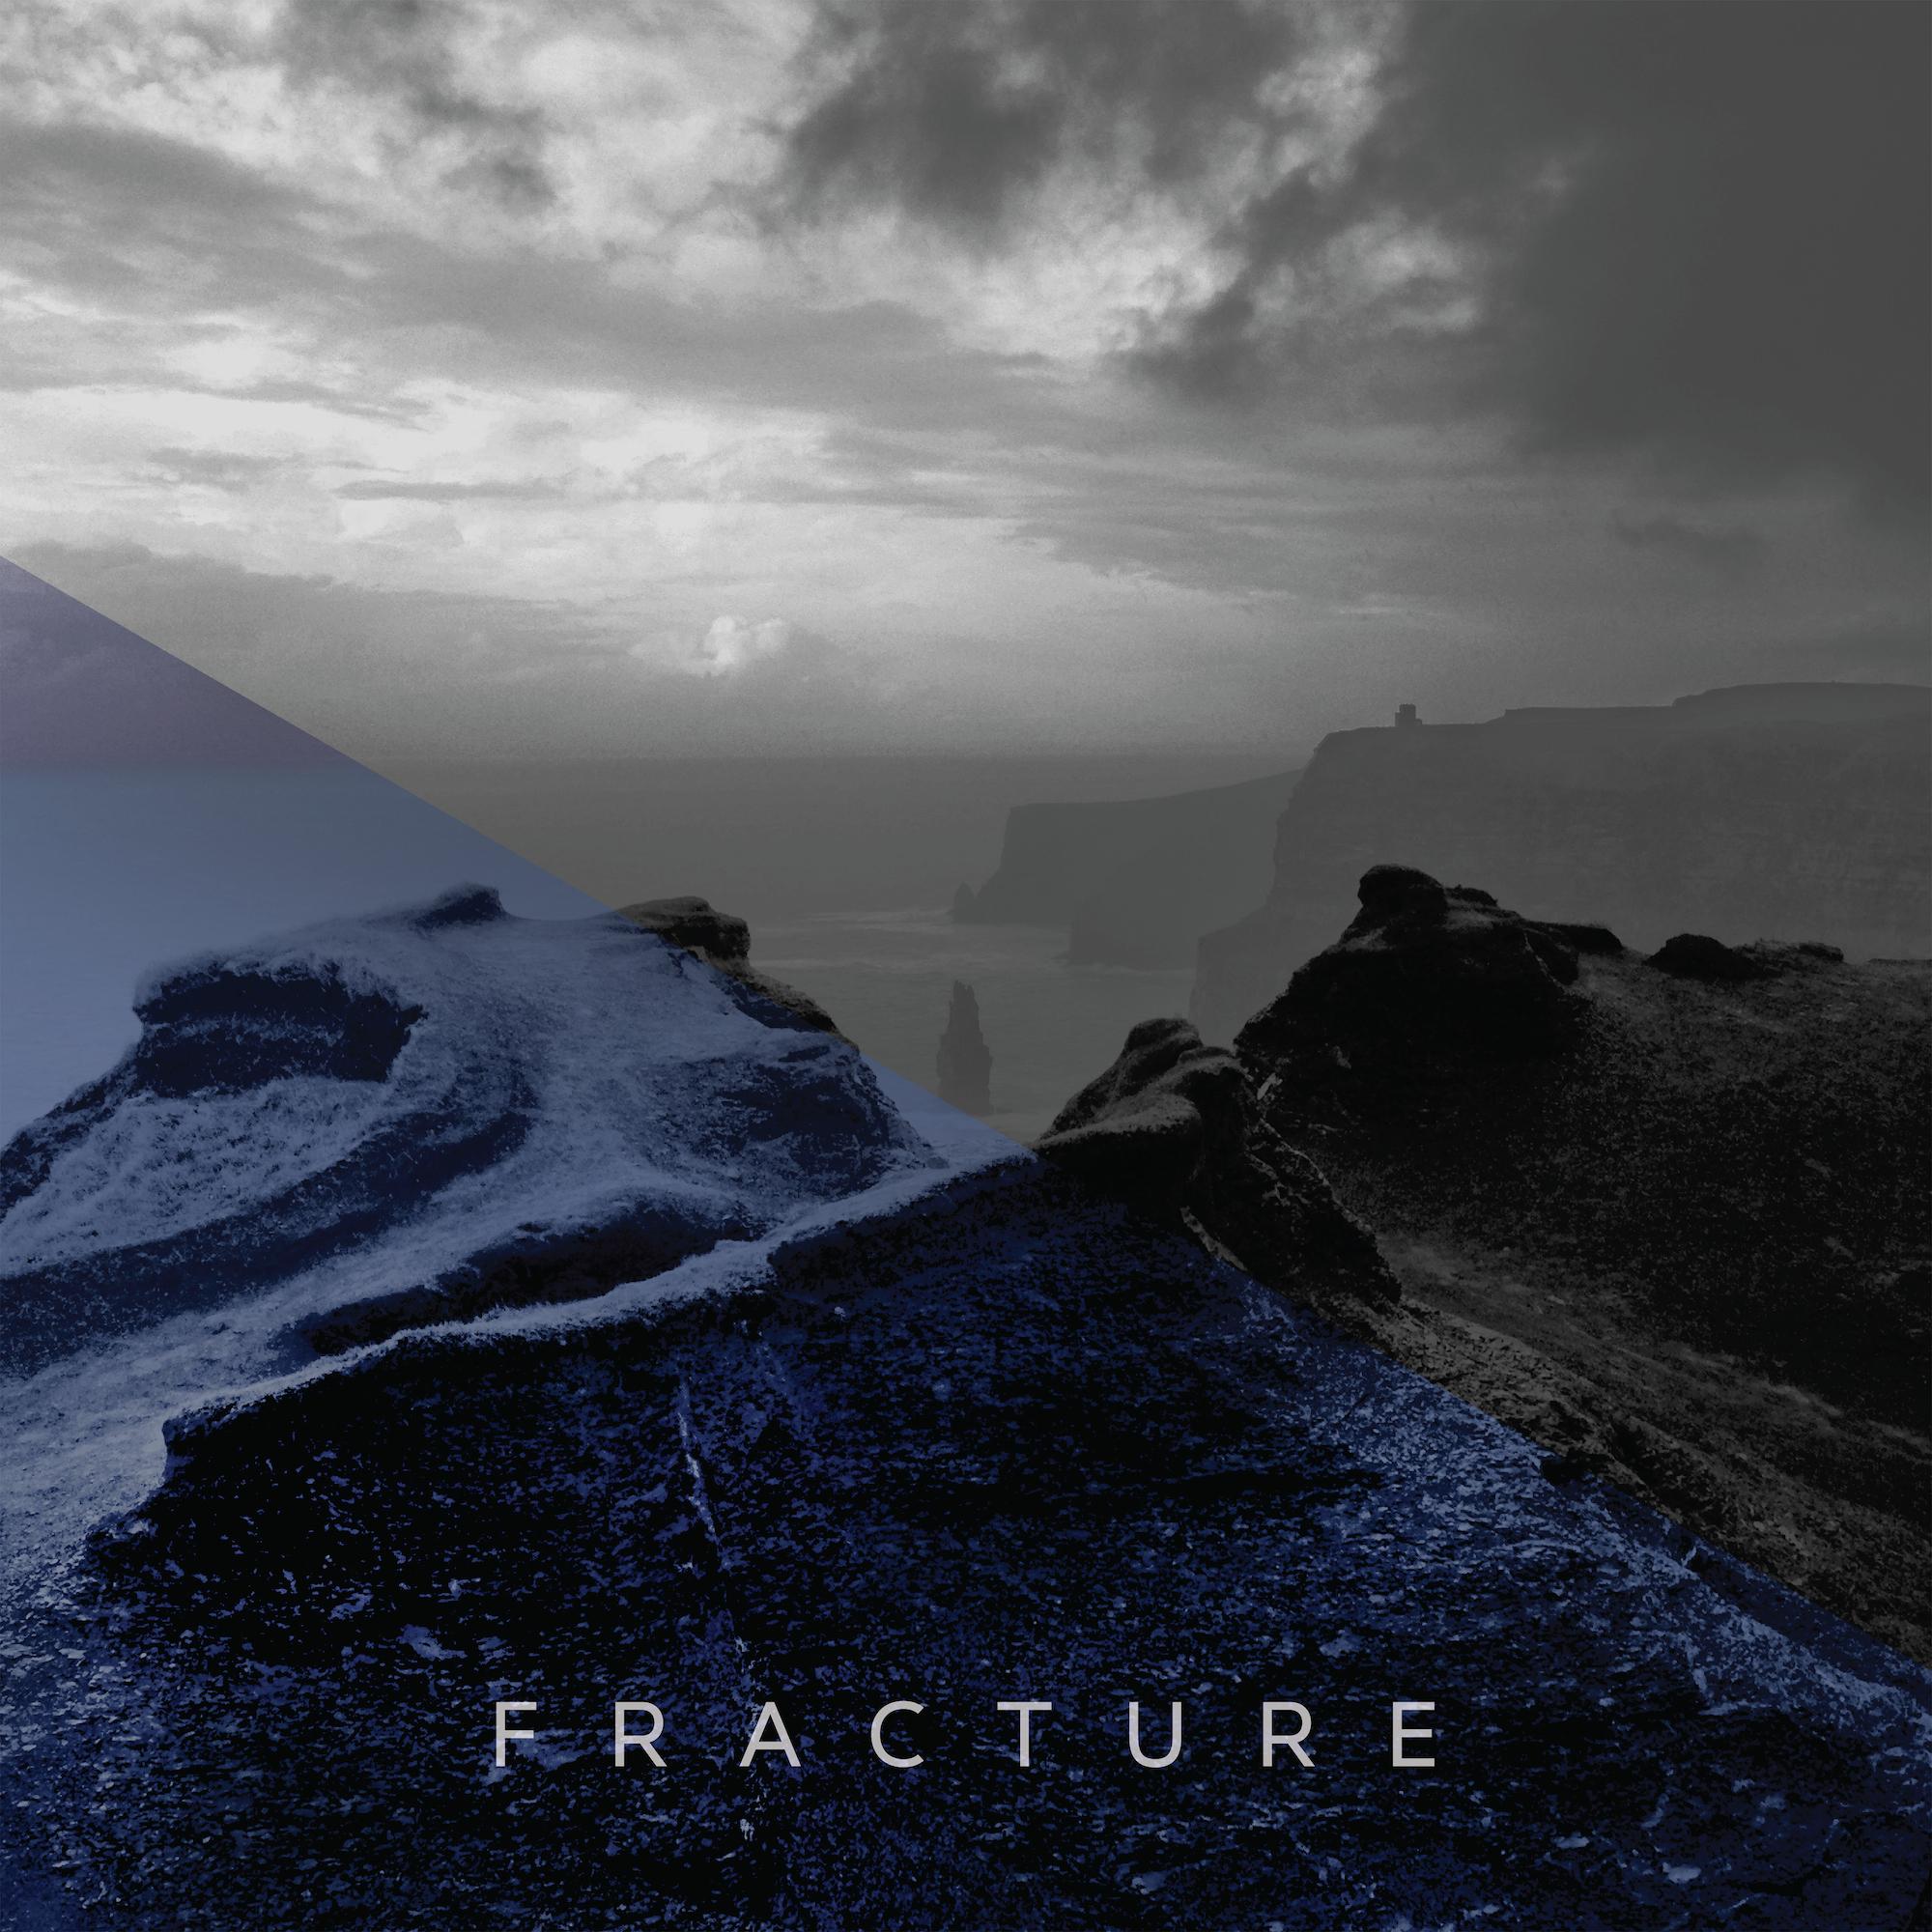 Fracture 2000x2000.jpg